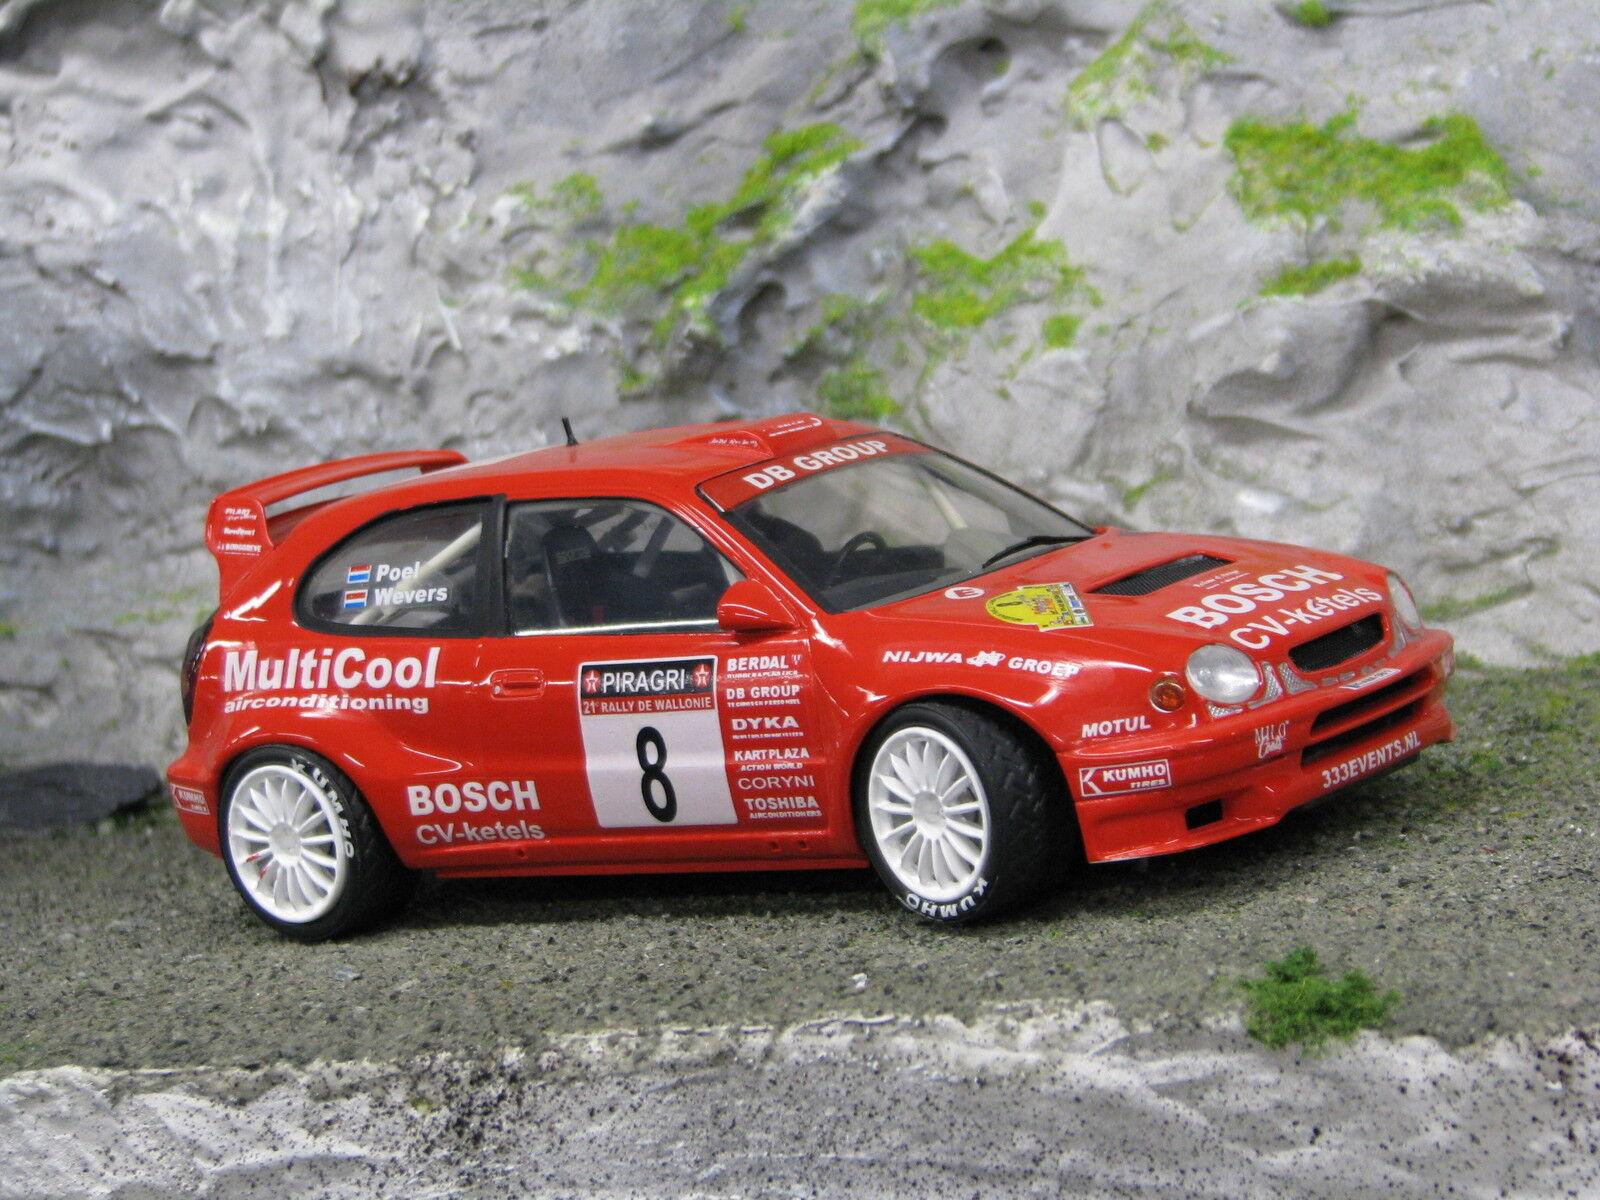 QSP Toyota Corolla WRC 1998 1 24 Wevers   Poel 21e Rally de Wallonie 2004